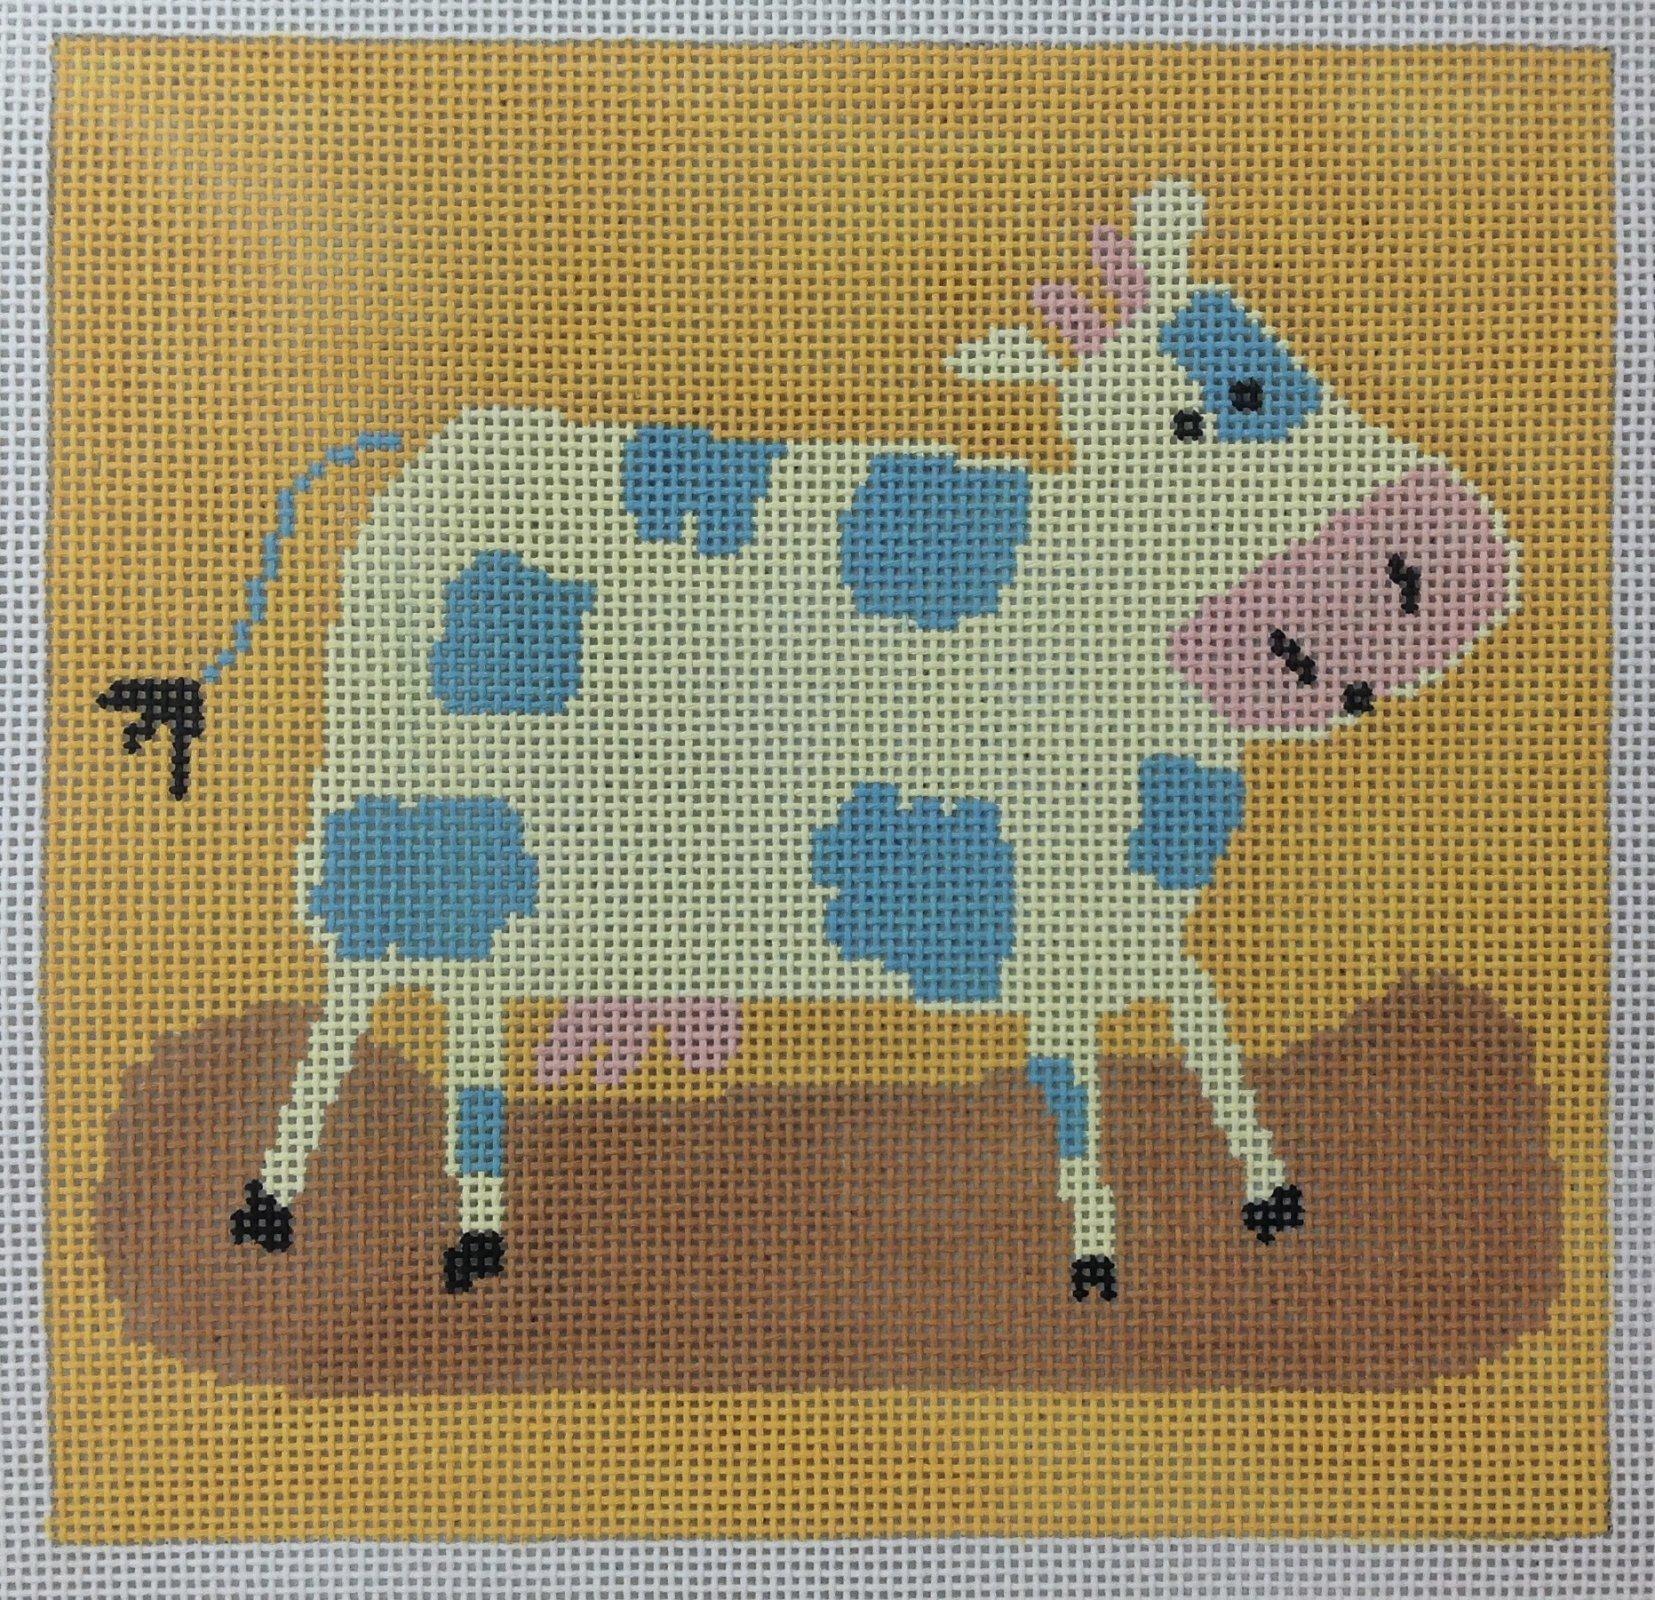 calico cow*